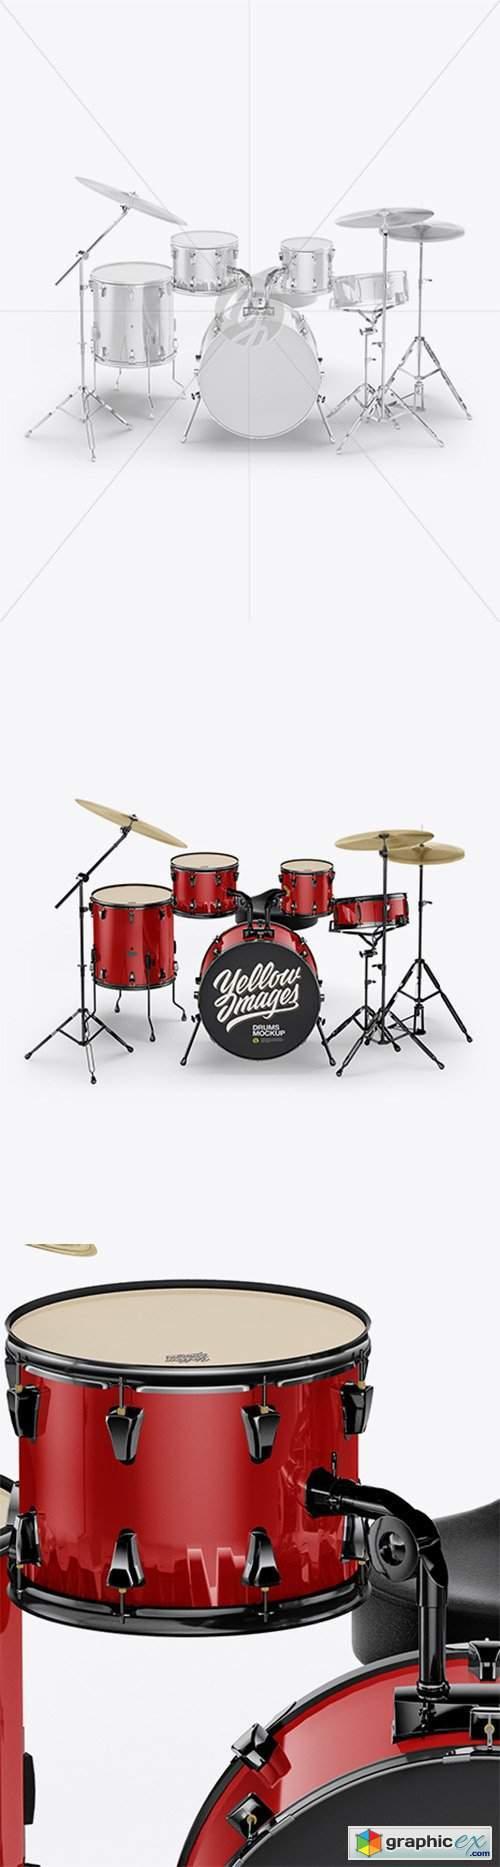 Drum Kit Mockup - Front View